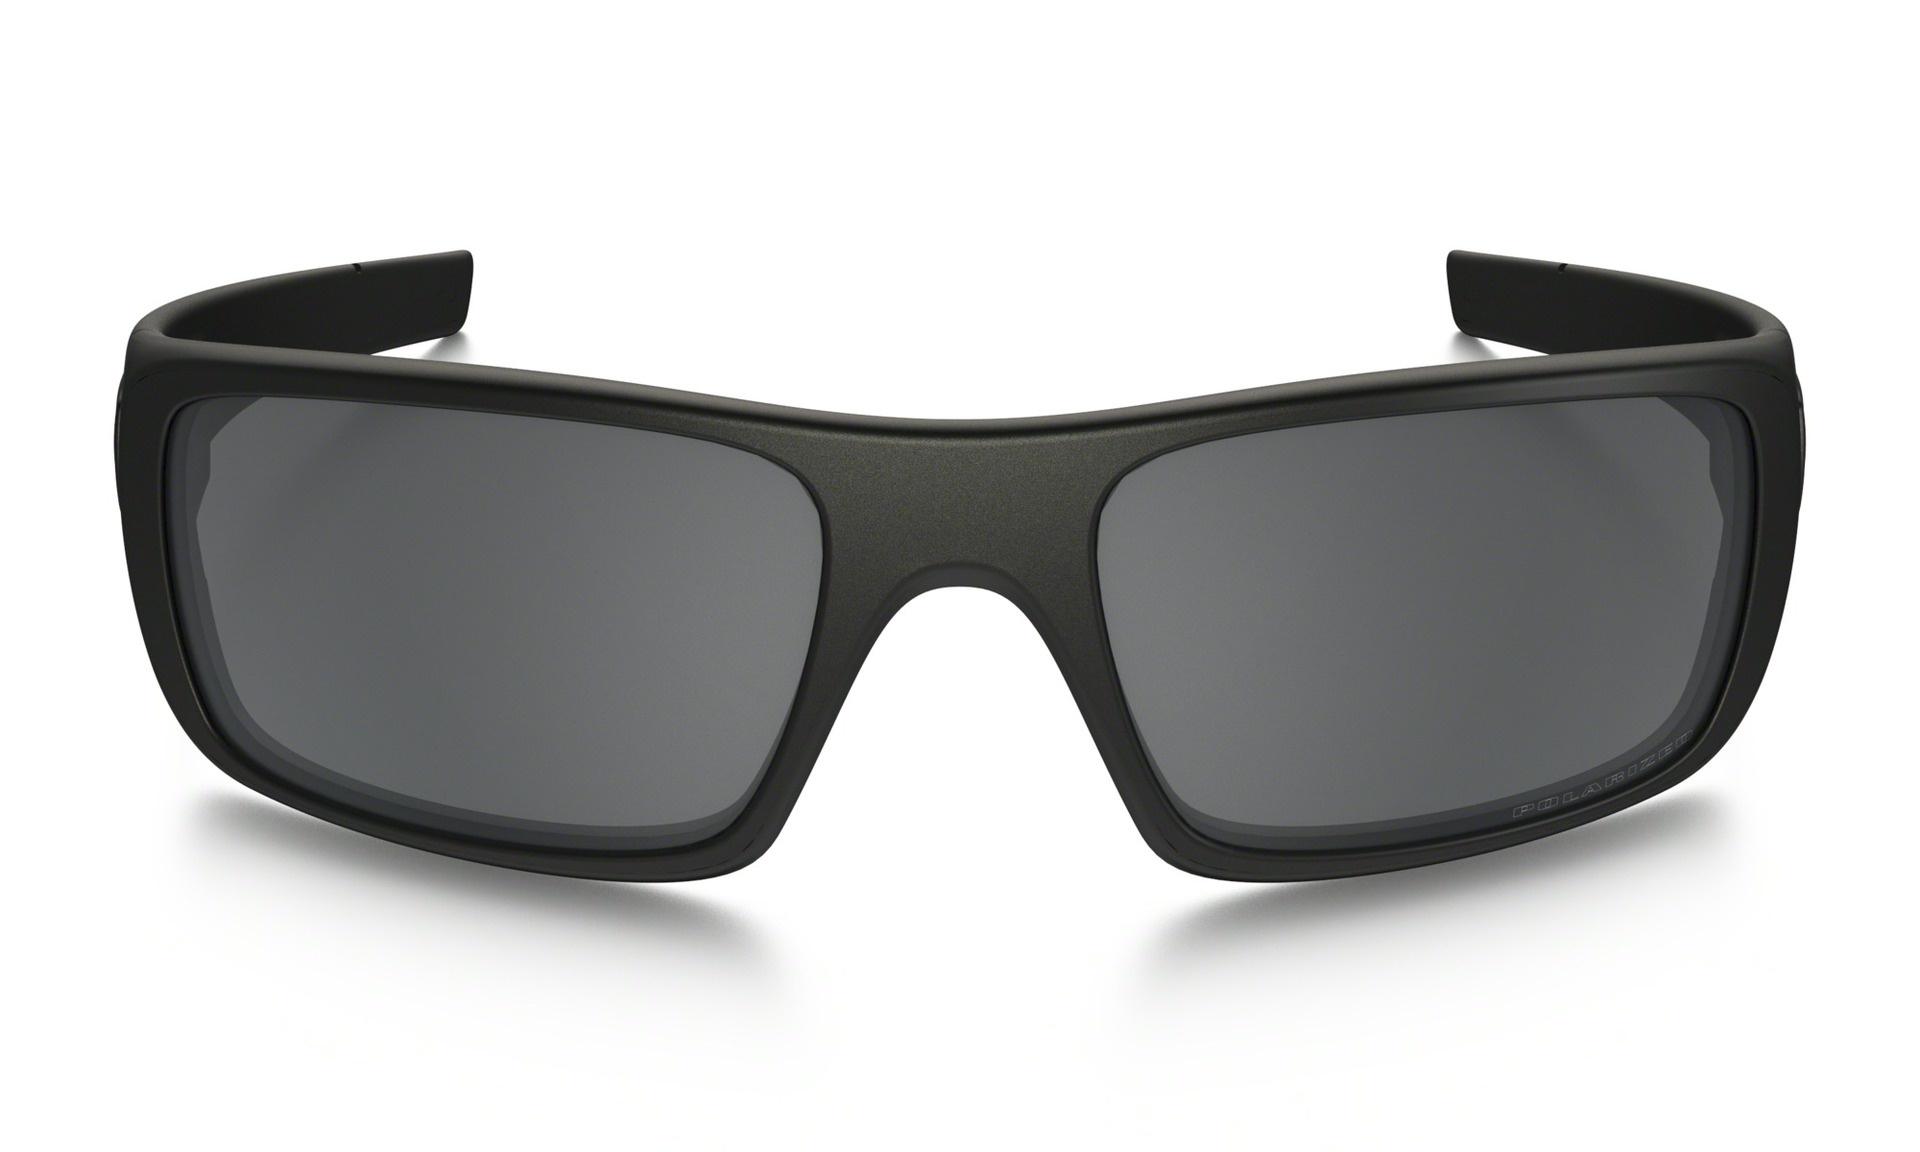 099dfe61b3d Oakley Crankshaft Matte Black Black Iridium Polarized - Out There Surf